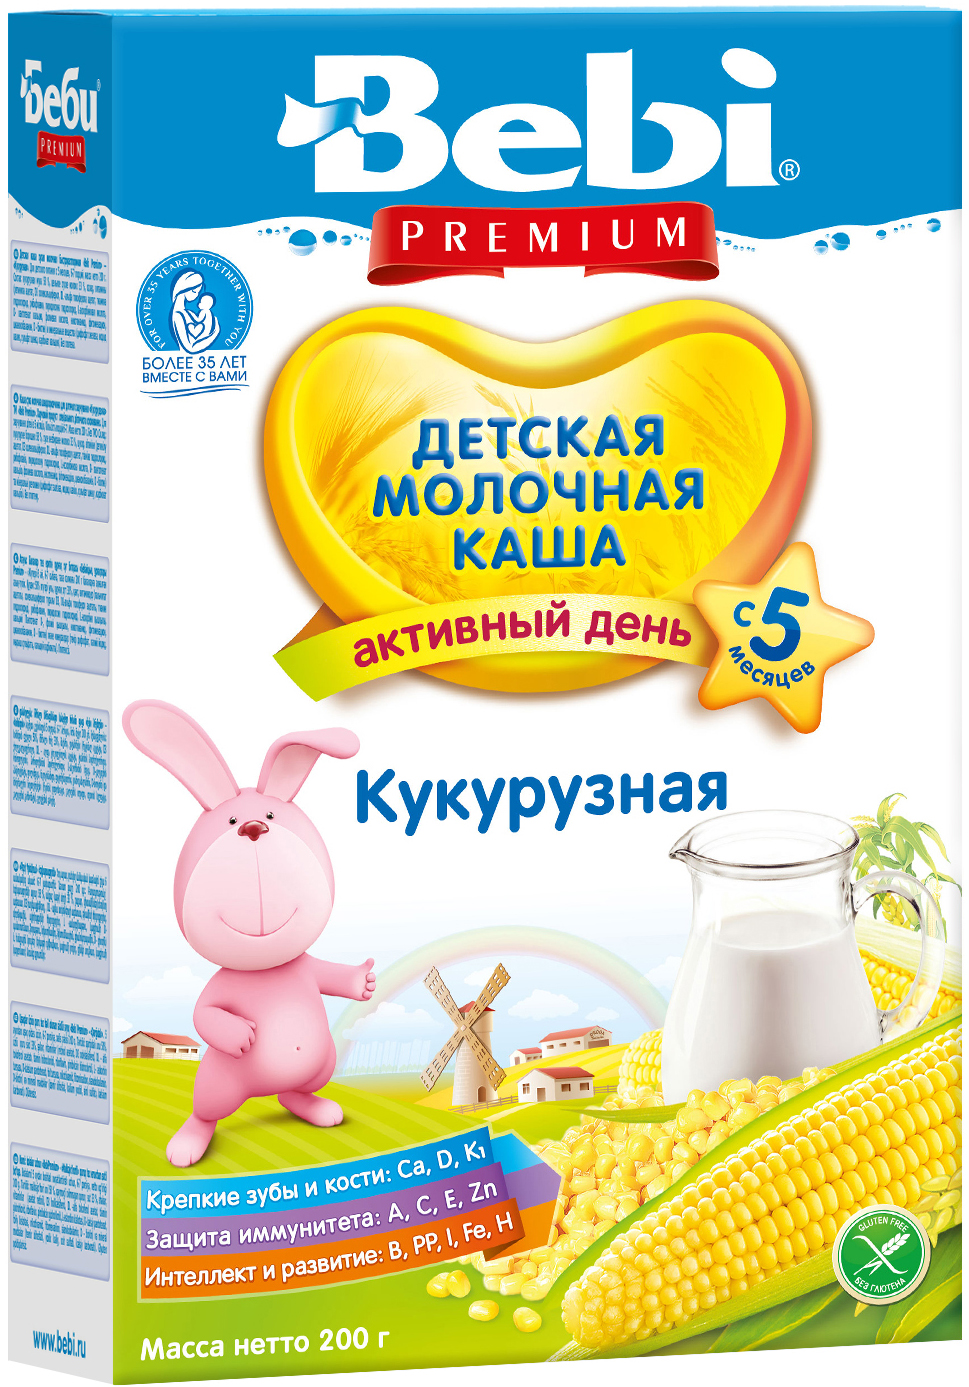 Каши Bebi Bebi Молочная кукурузная (с 5 месяцев) 200 г картридж kyocera tk 3130 black for fs 4200dn fs 4300dn m3550idn m3560idn